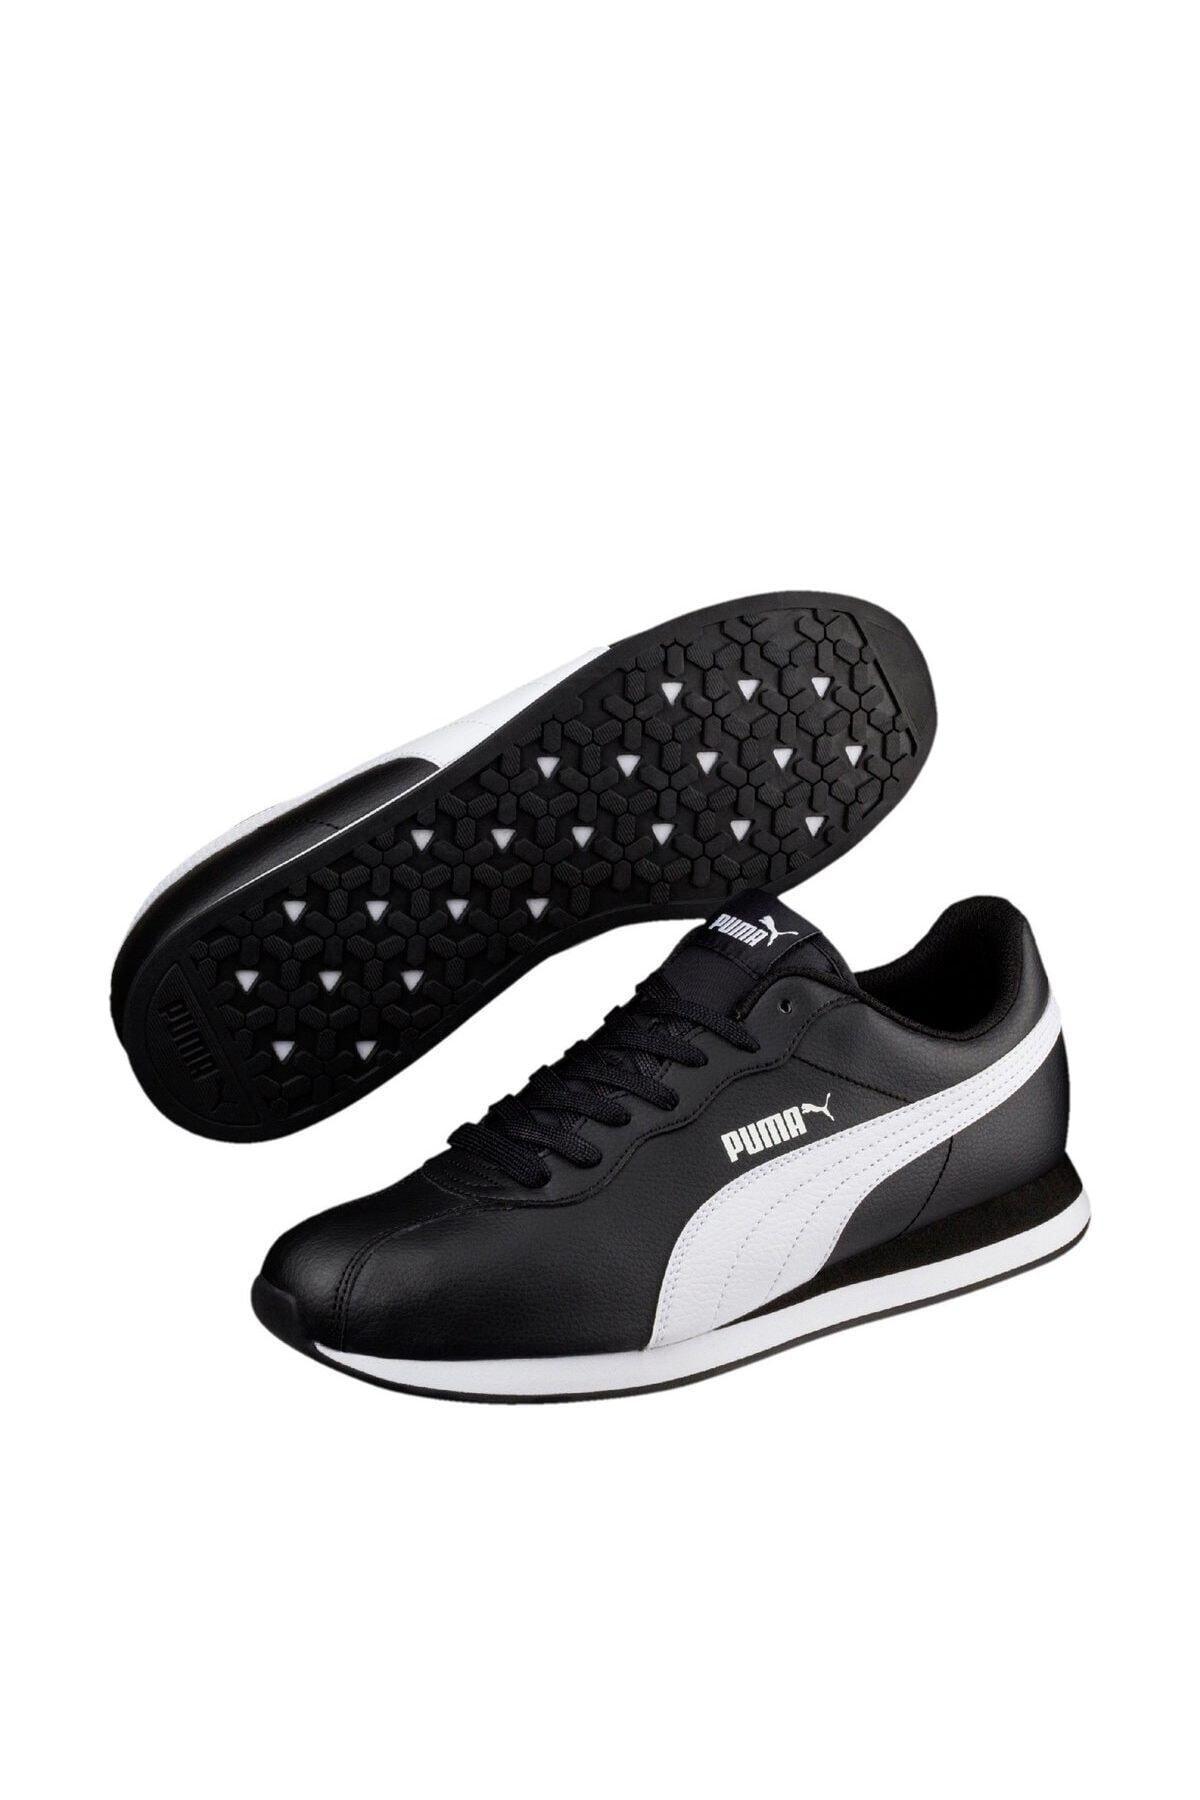 Puma Turin II Siyah  Erkek Spor Ayakkabı (366962-01) 1